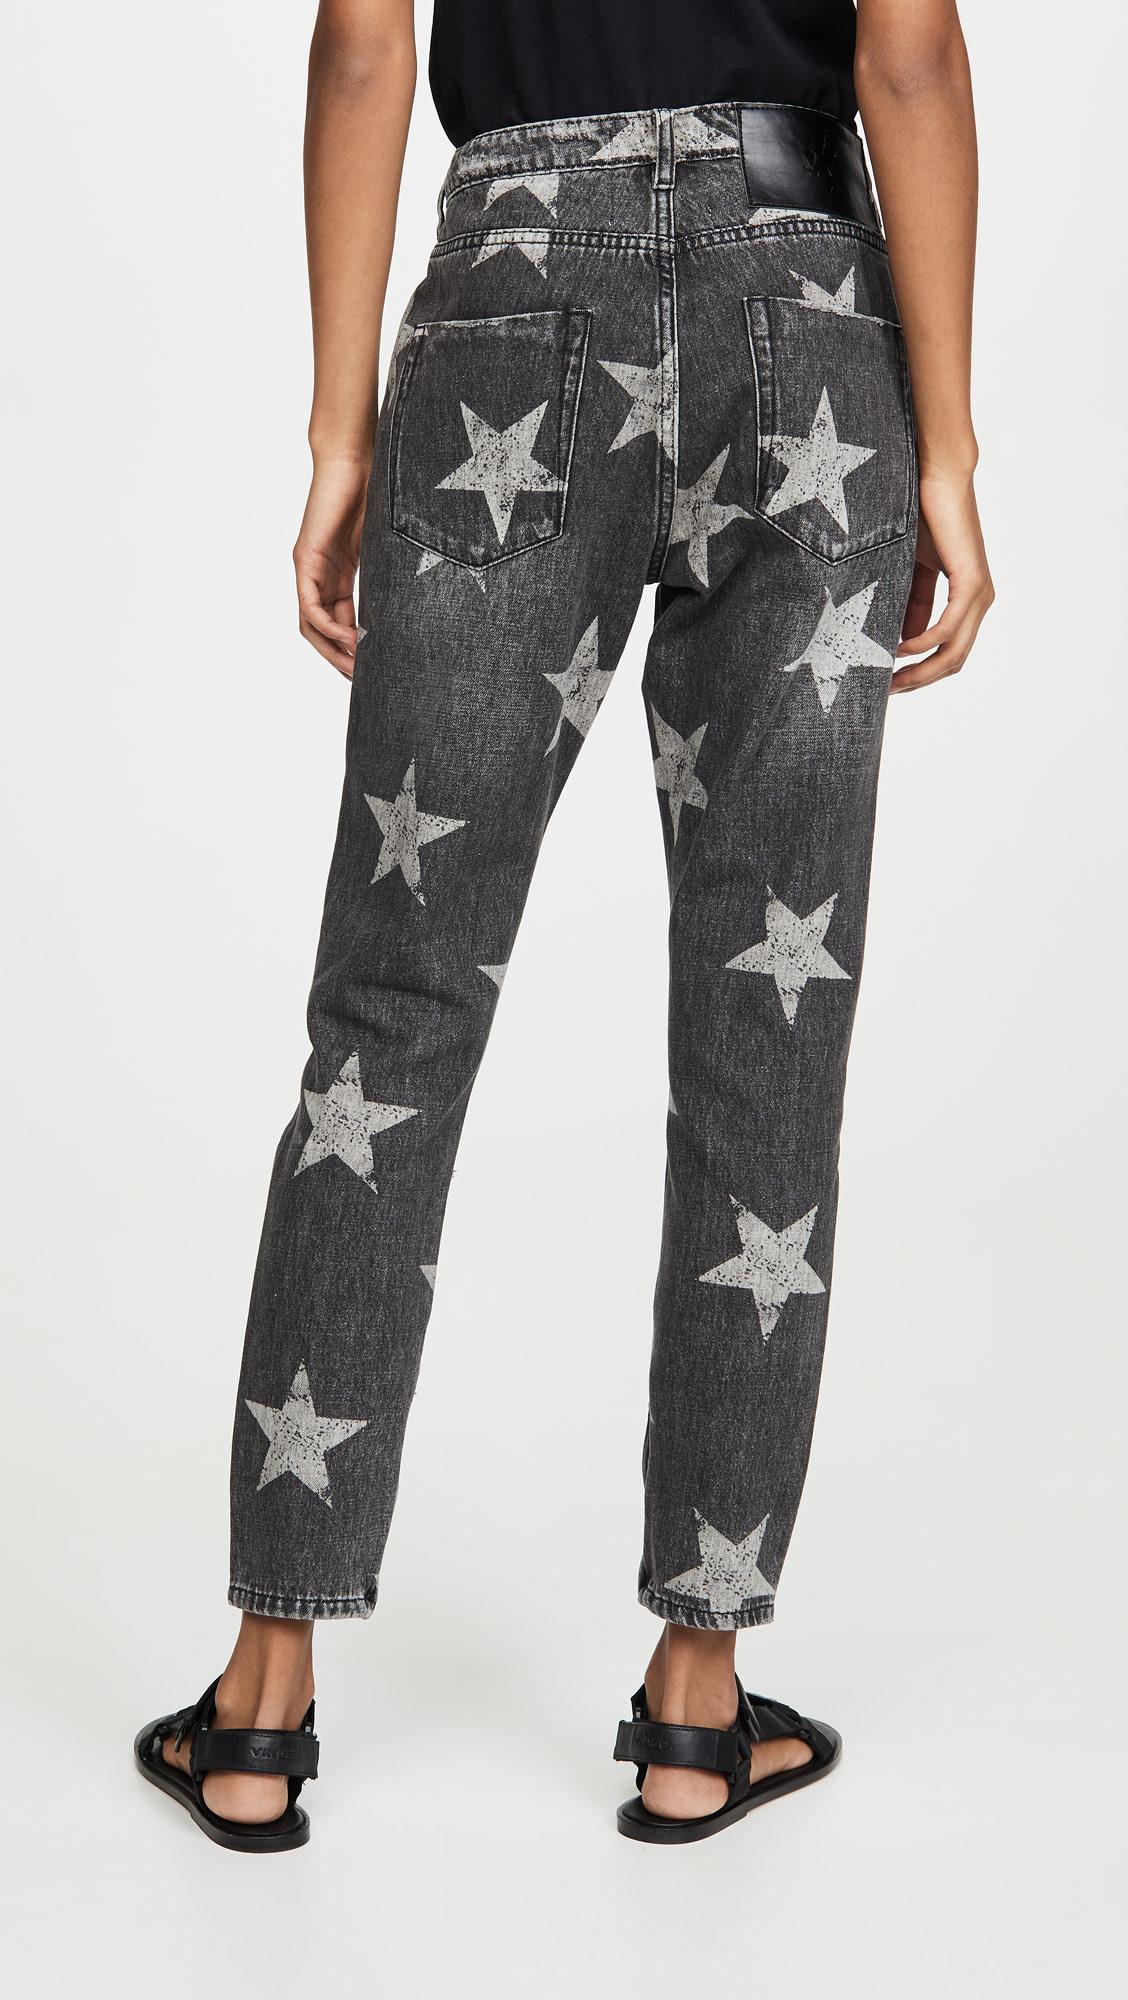 Freebirds High Waist Skinny Jean